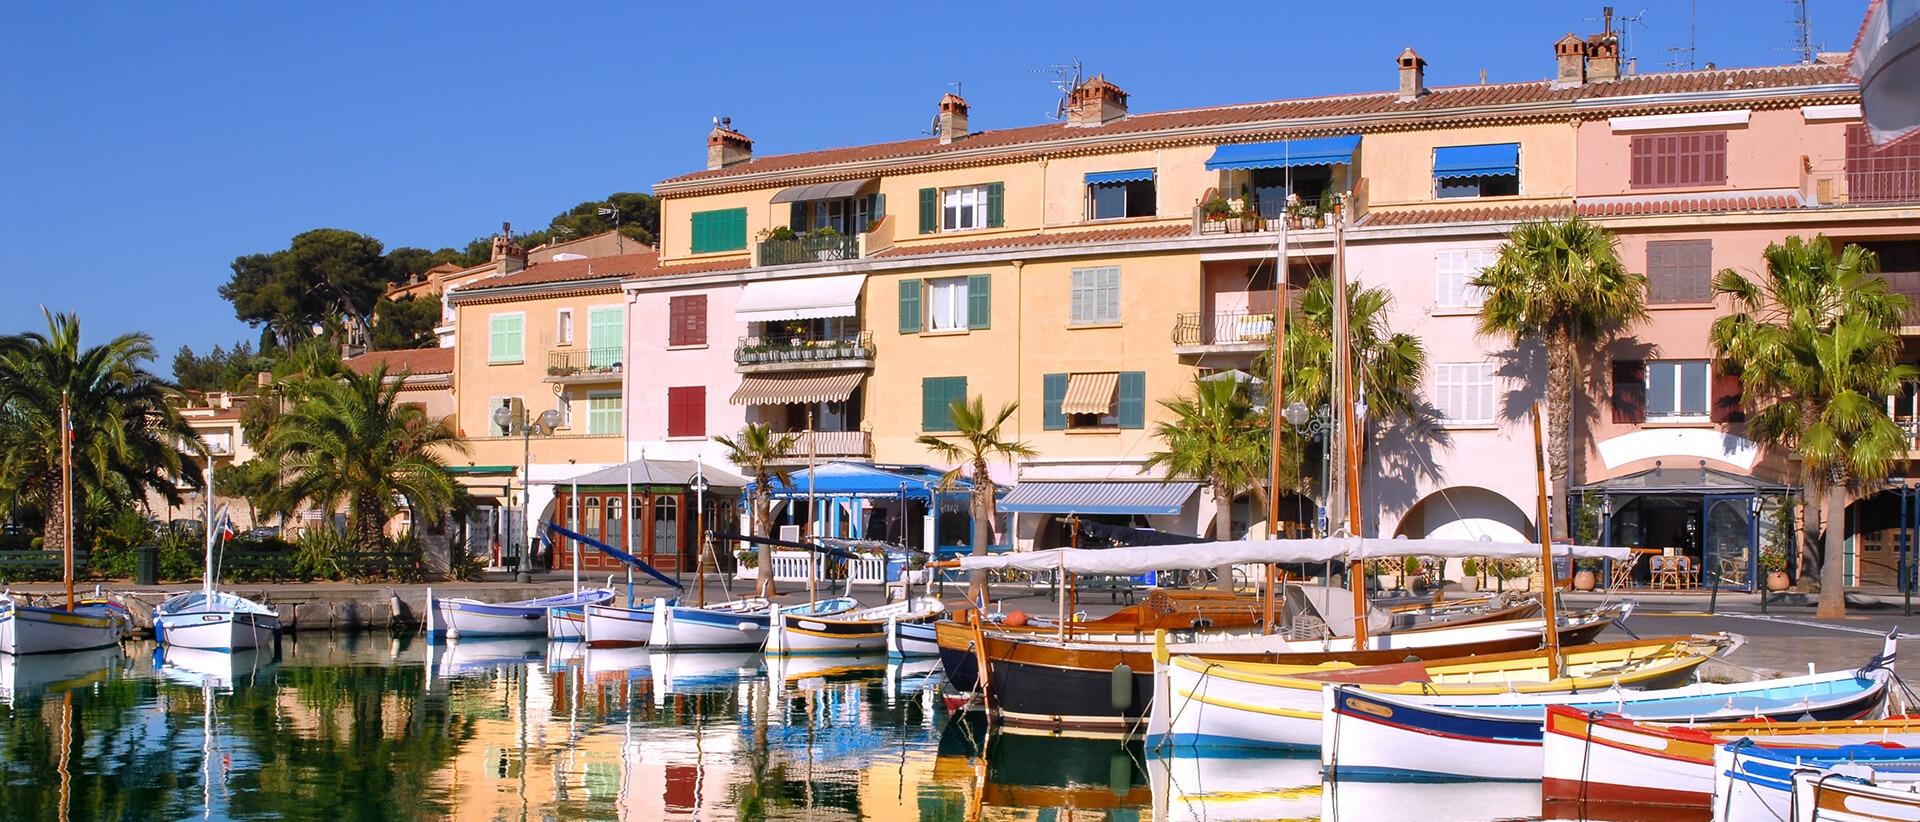 Sanary-sur-Mer, France